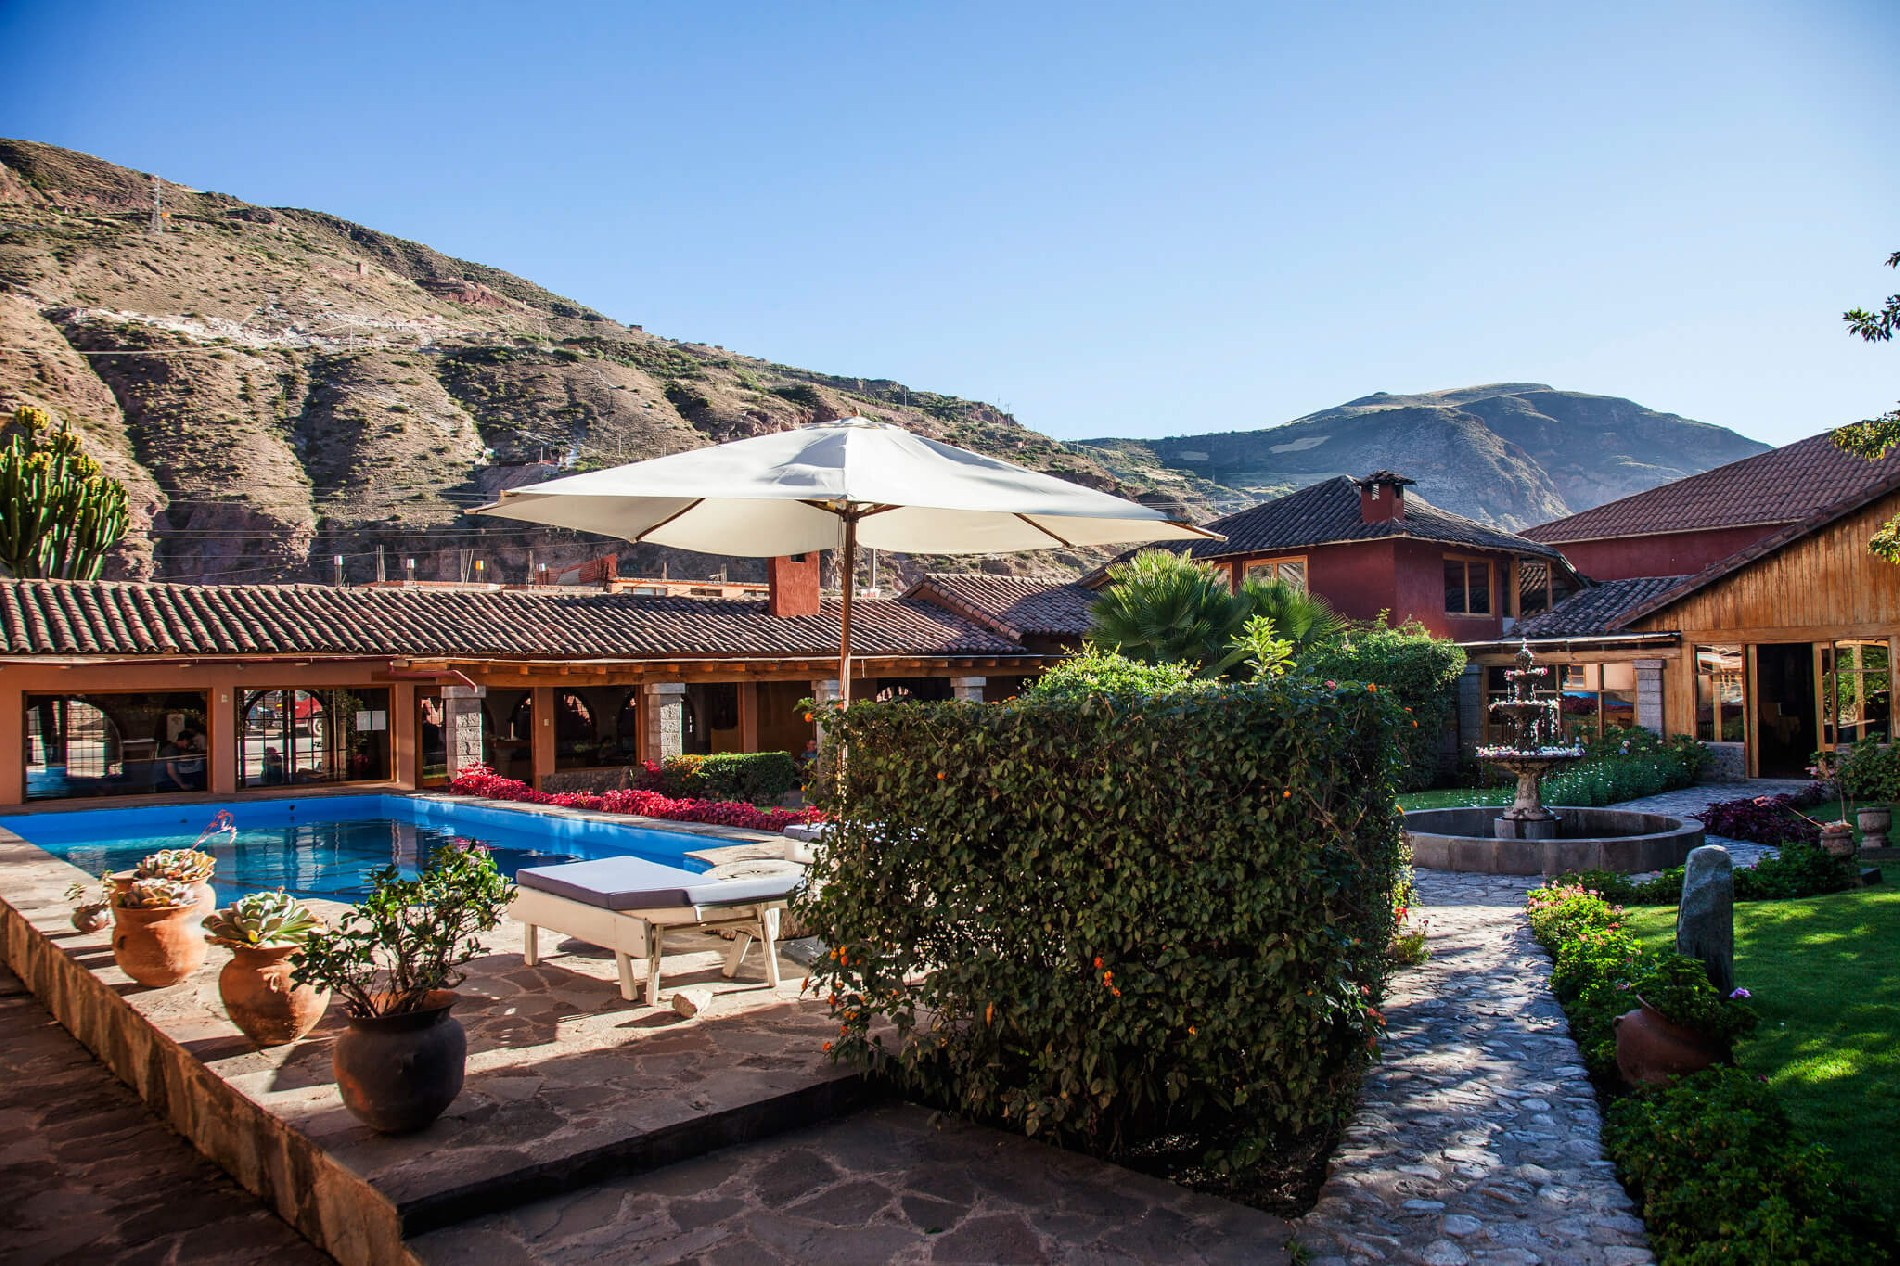 Hotel san agust n urubamba spa peru web oficial - Hotel valle aurina con piscina ...